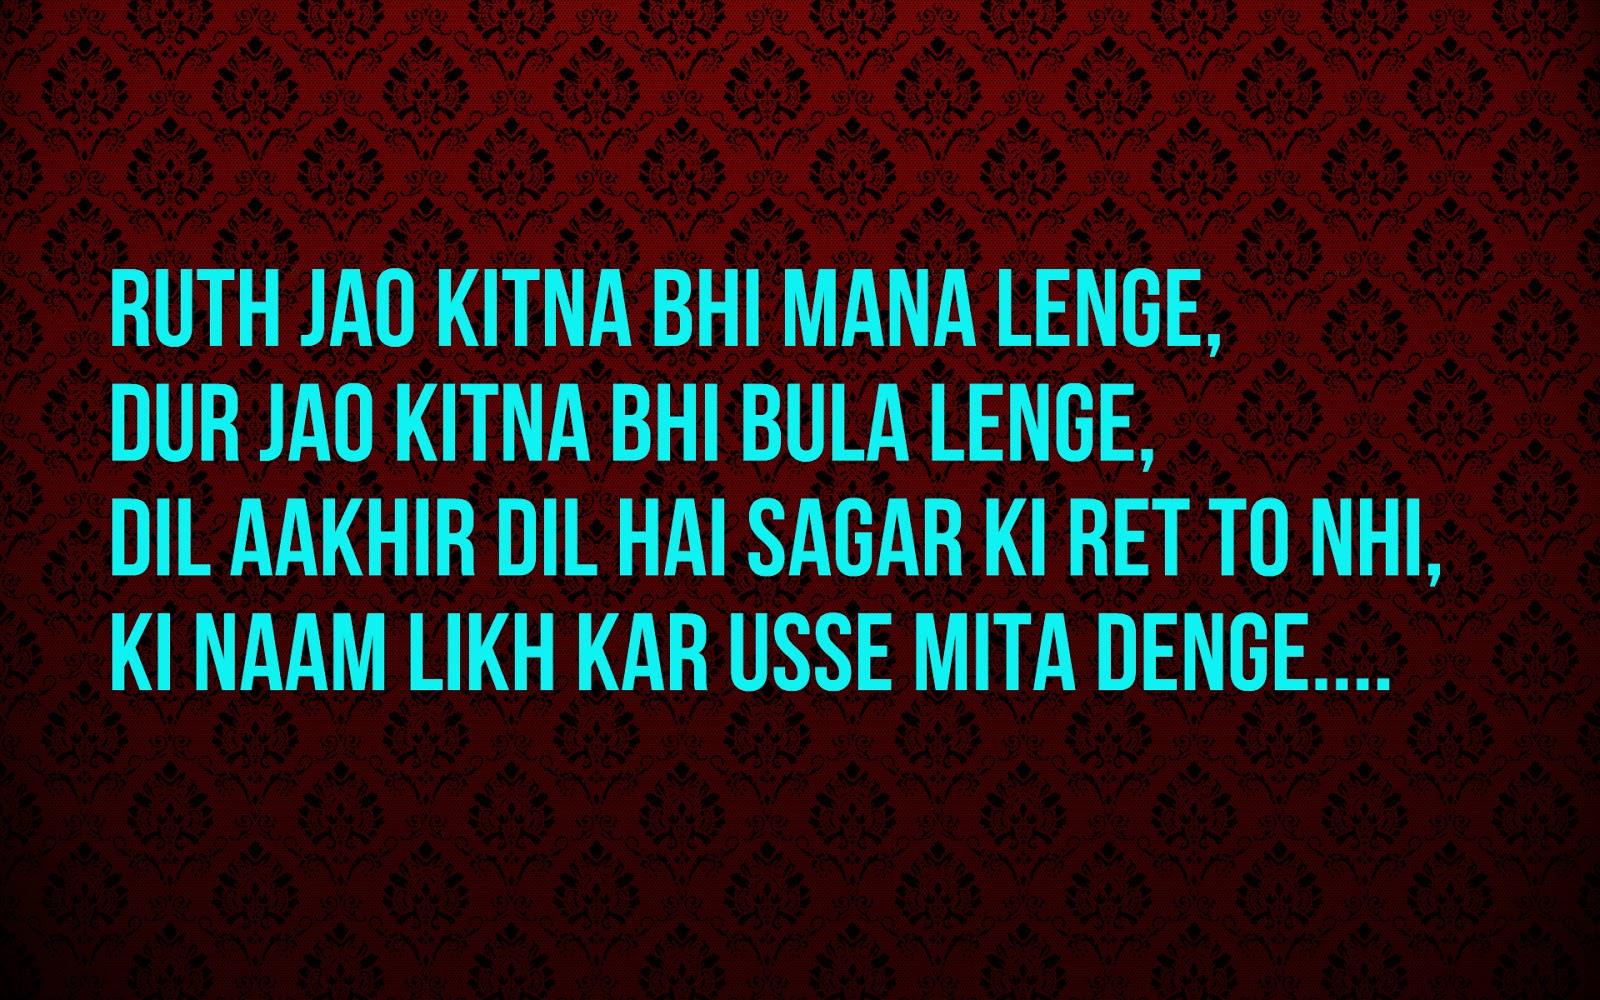 Dard Bhare Wallpaper Hd Hd Wallpaper Dard Bhari Shayari In Hindi